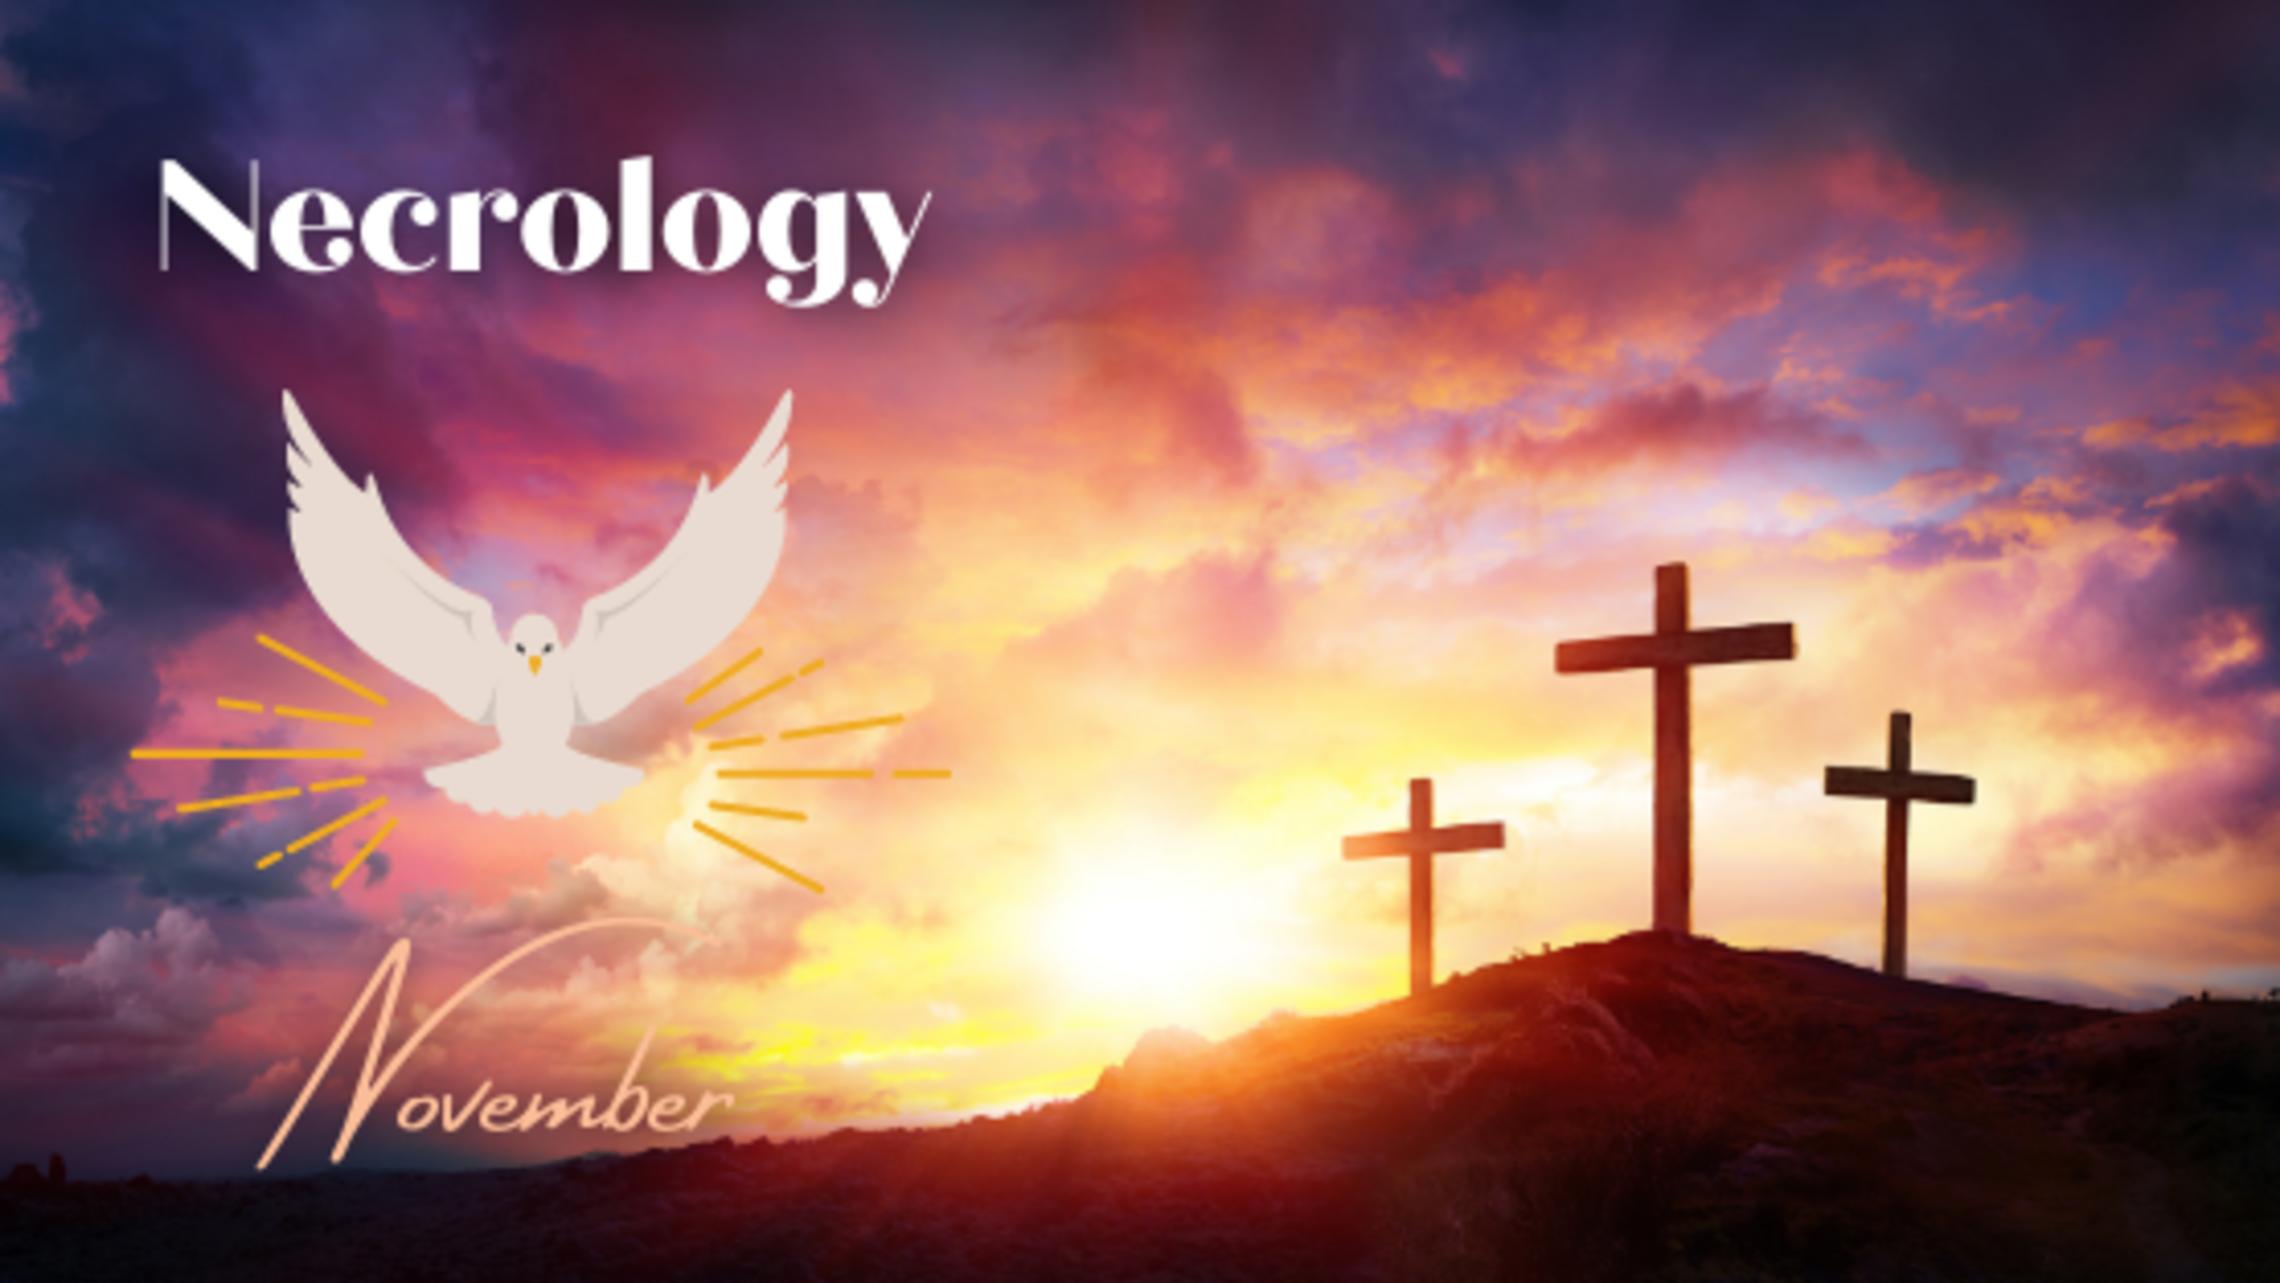 November 2021 Necrology